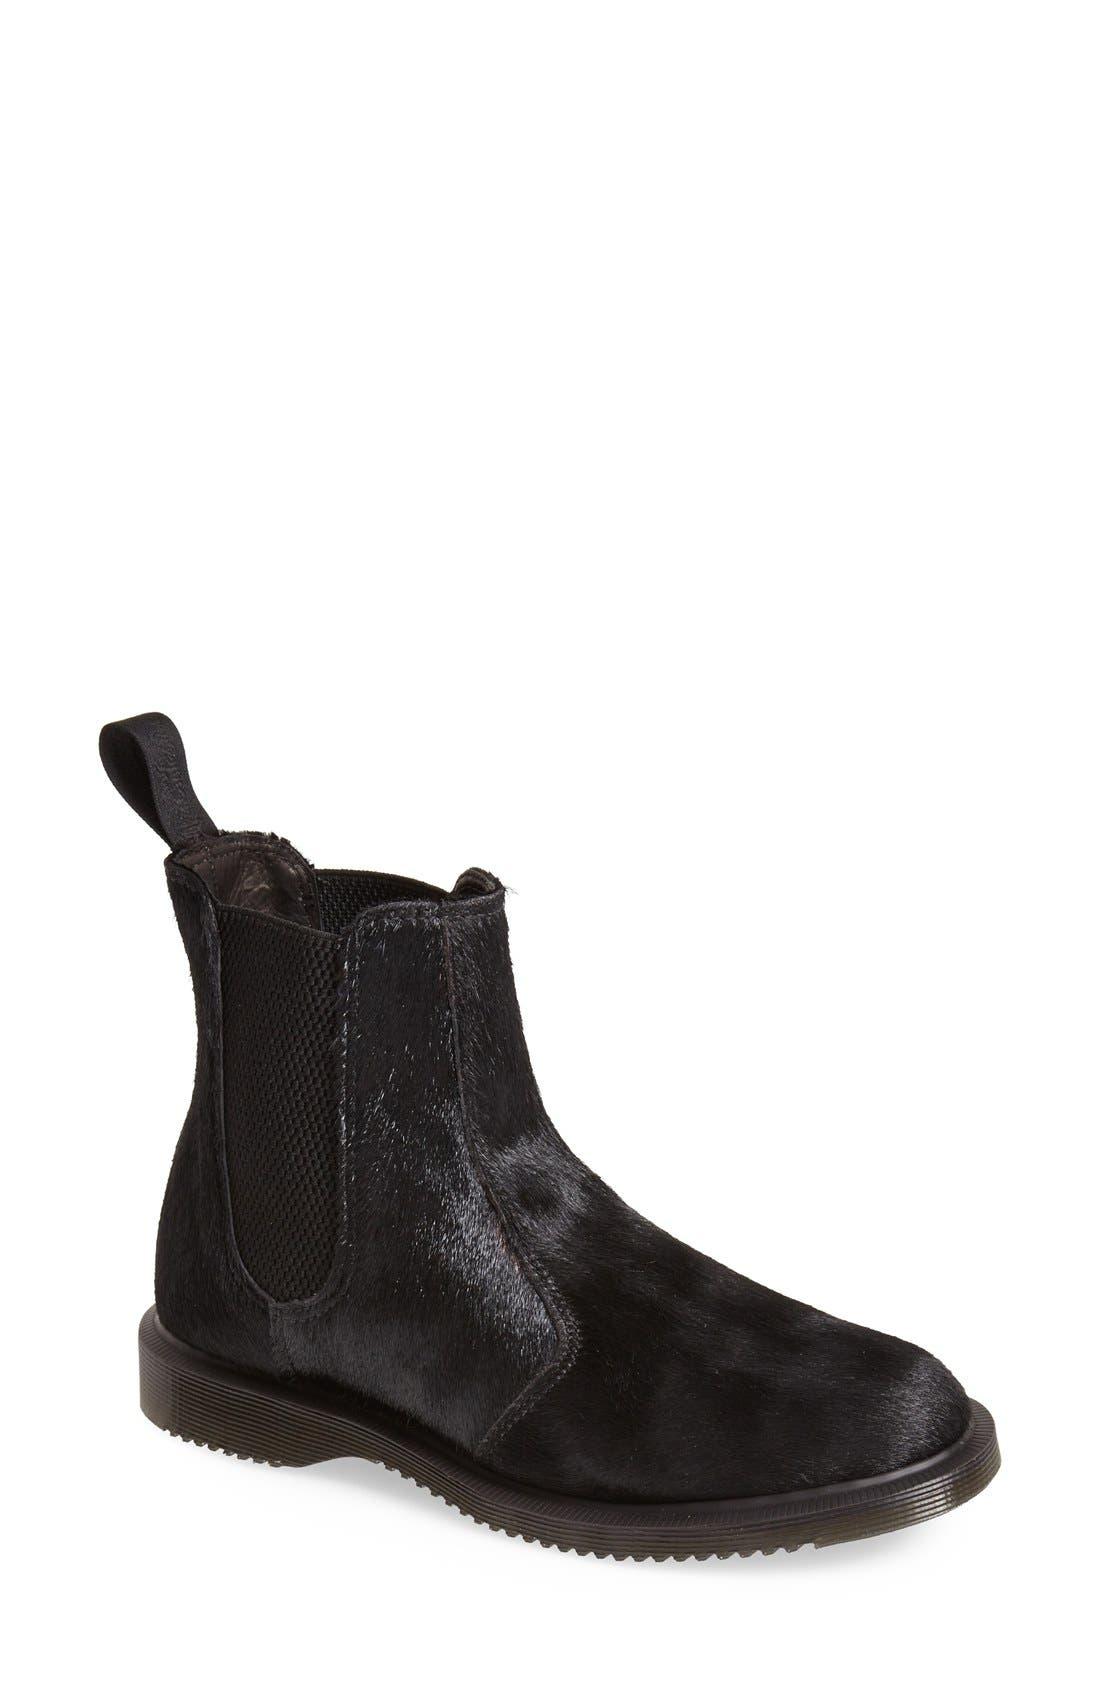 Alternate Image 1 Selected - Dr. Martens 'Flora' Calf Hair Chelsea Boot (Women)